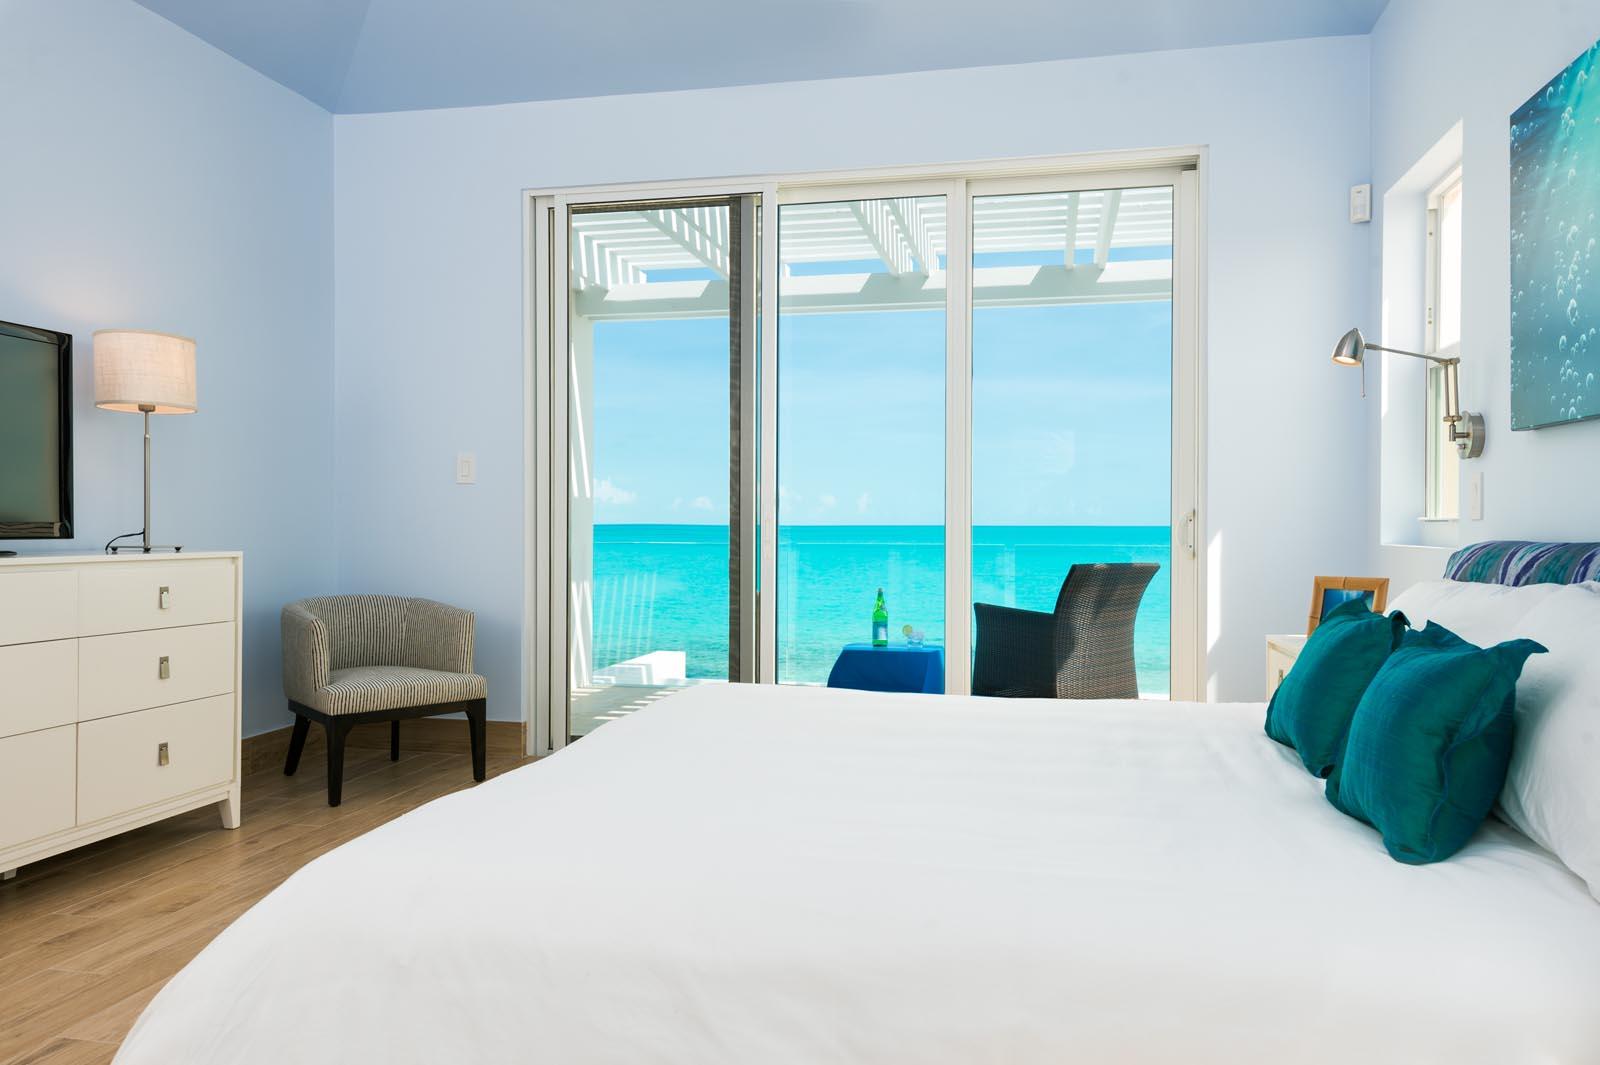 Villa Isla has 5 equal master bedrooms each with stunning ocean views